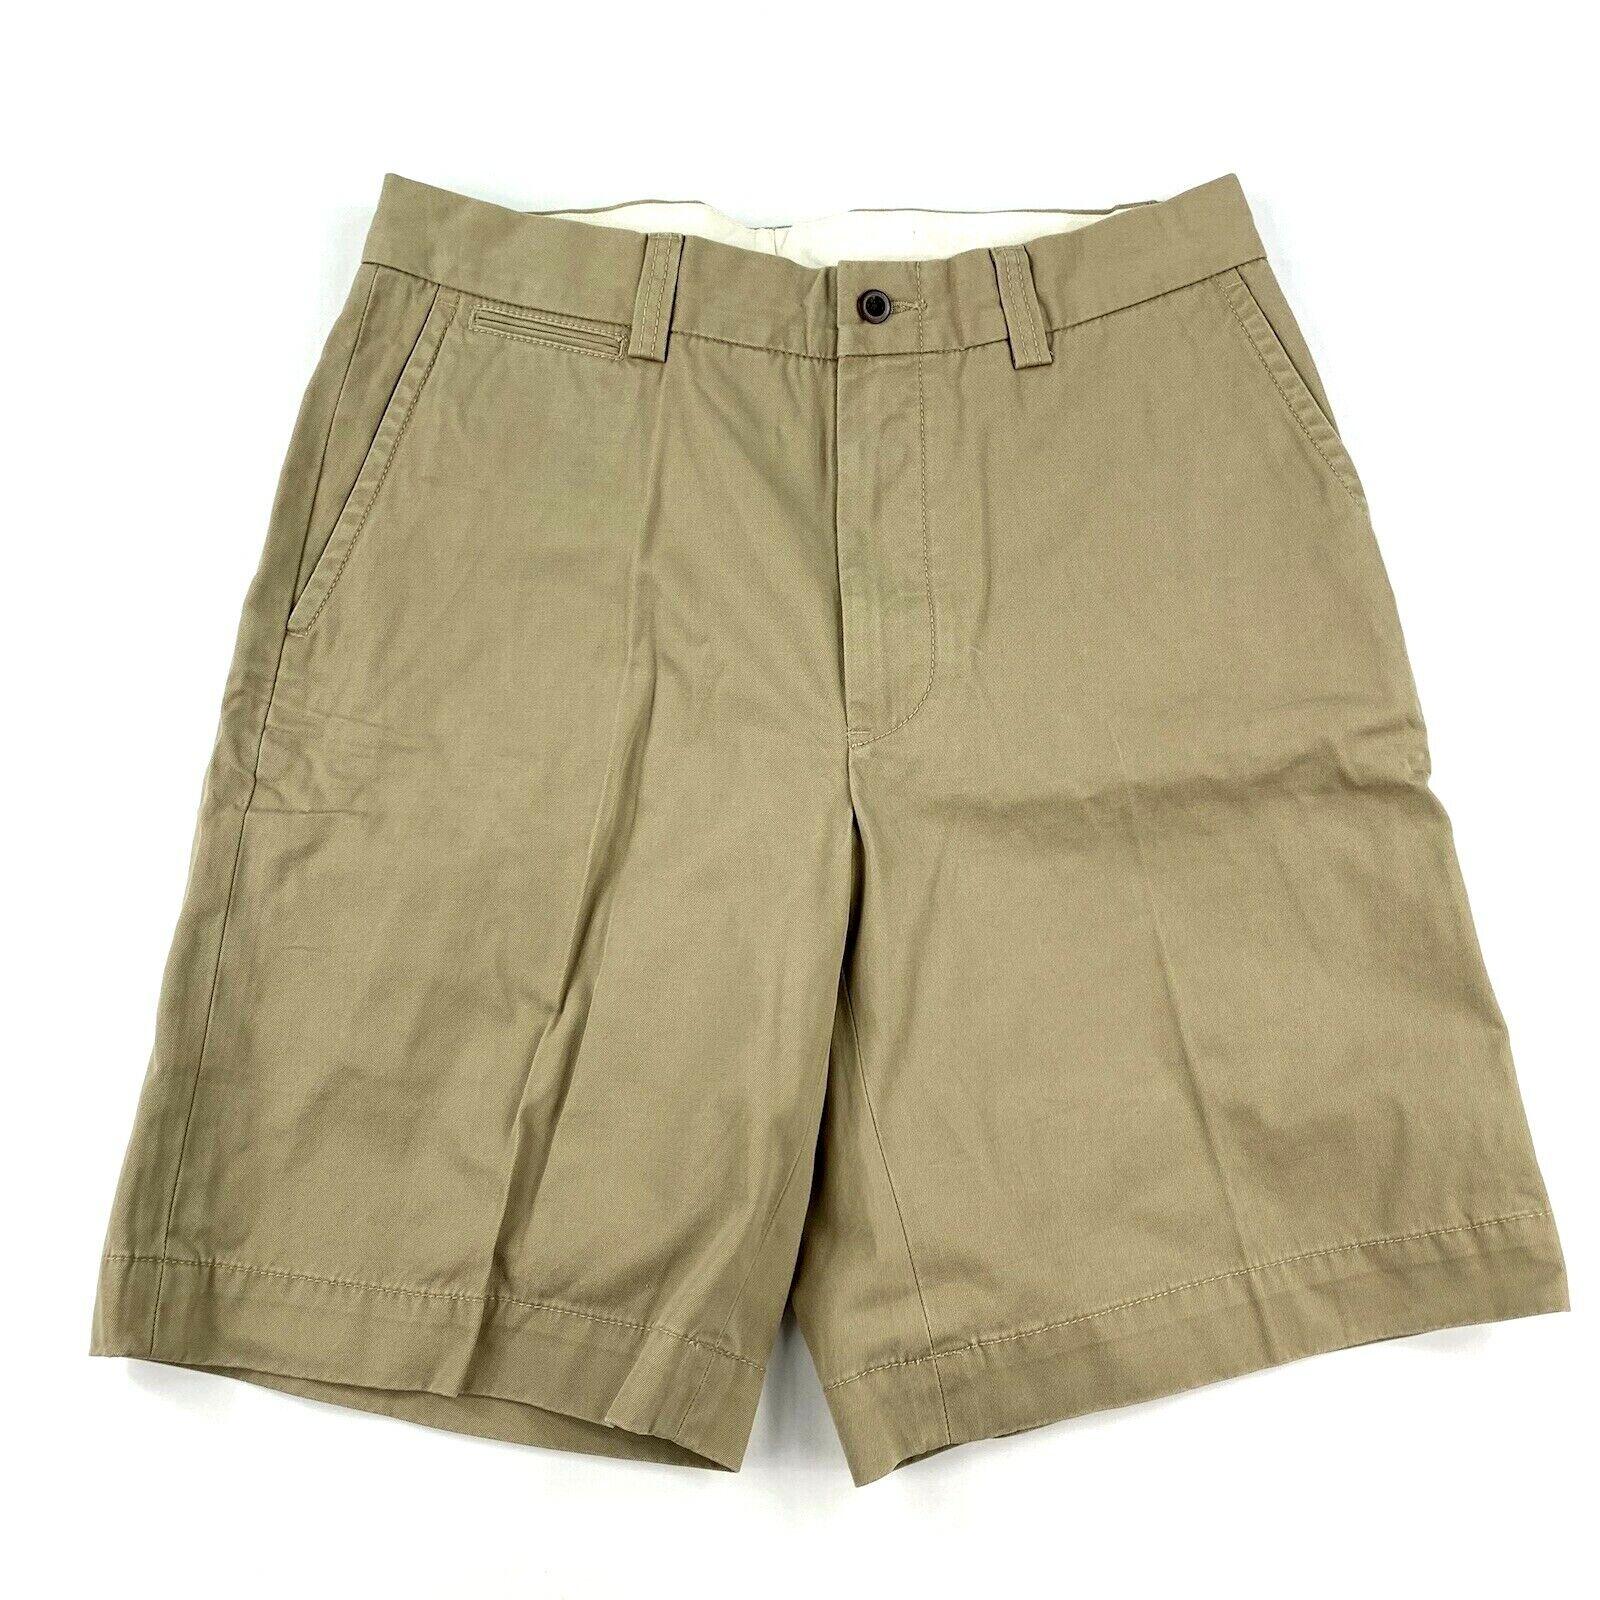 Polo Ralph Lauren Mens 32 Shorts GI Fit Khaki New